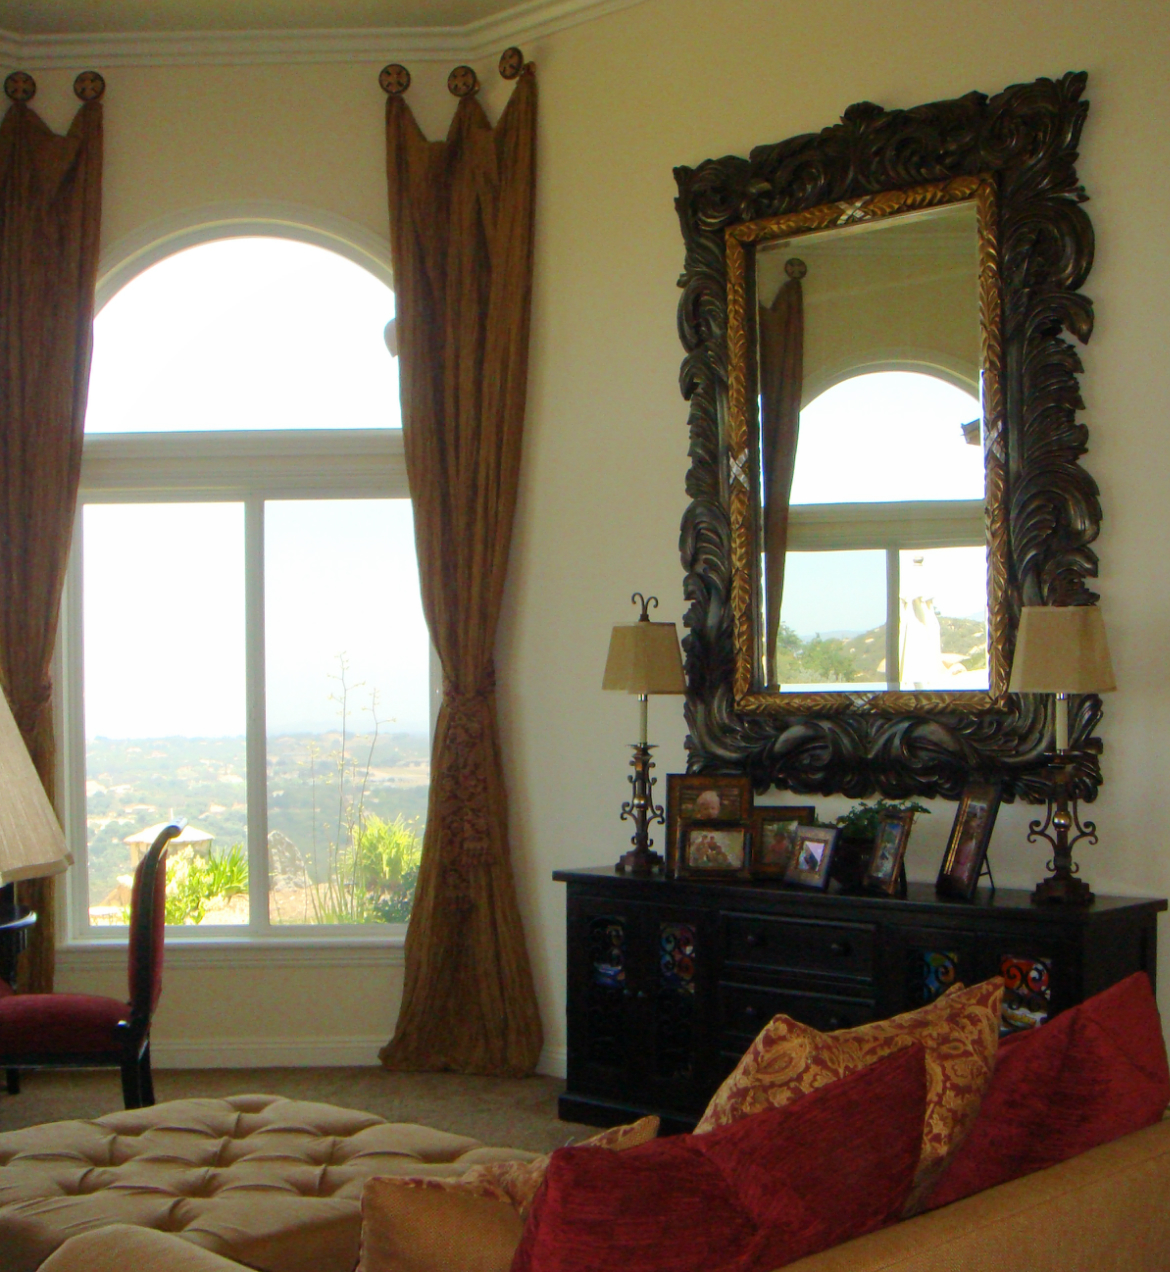 Window Treatments, Large Mirror